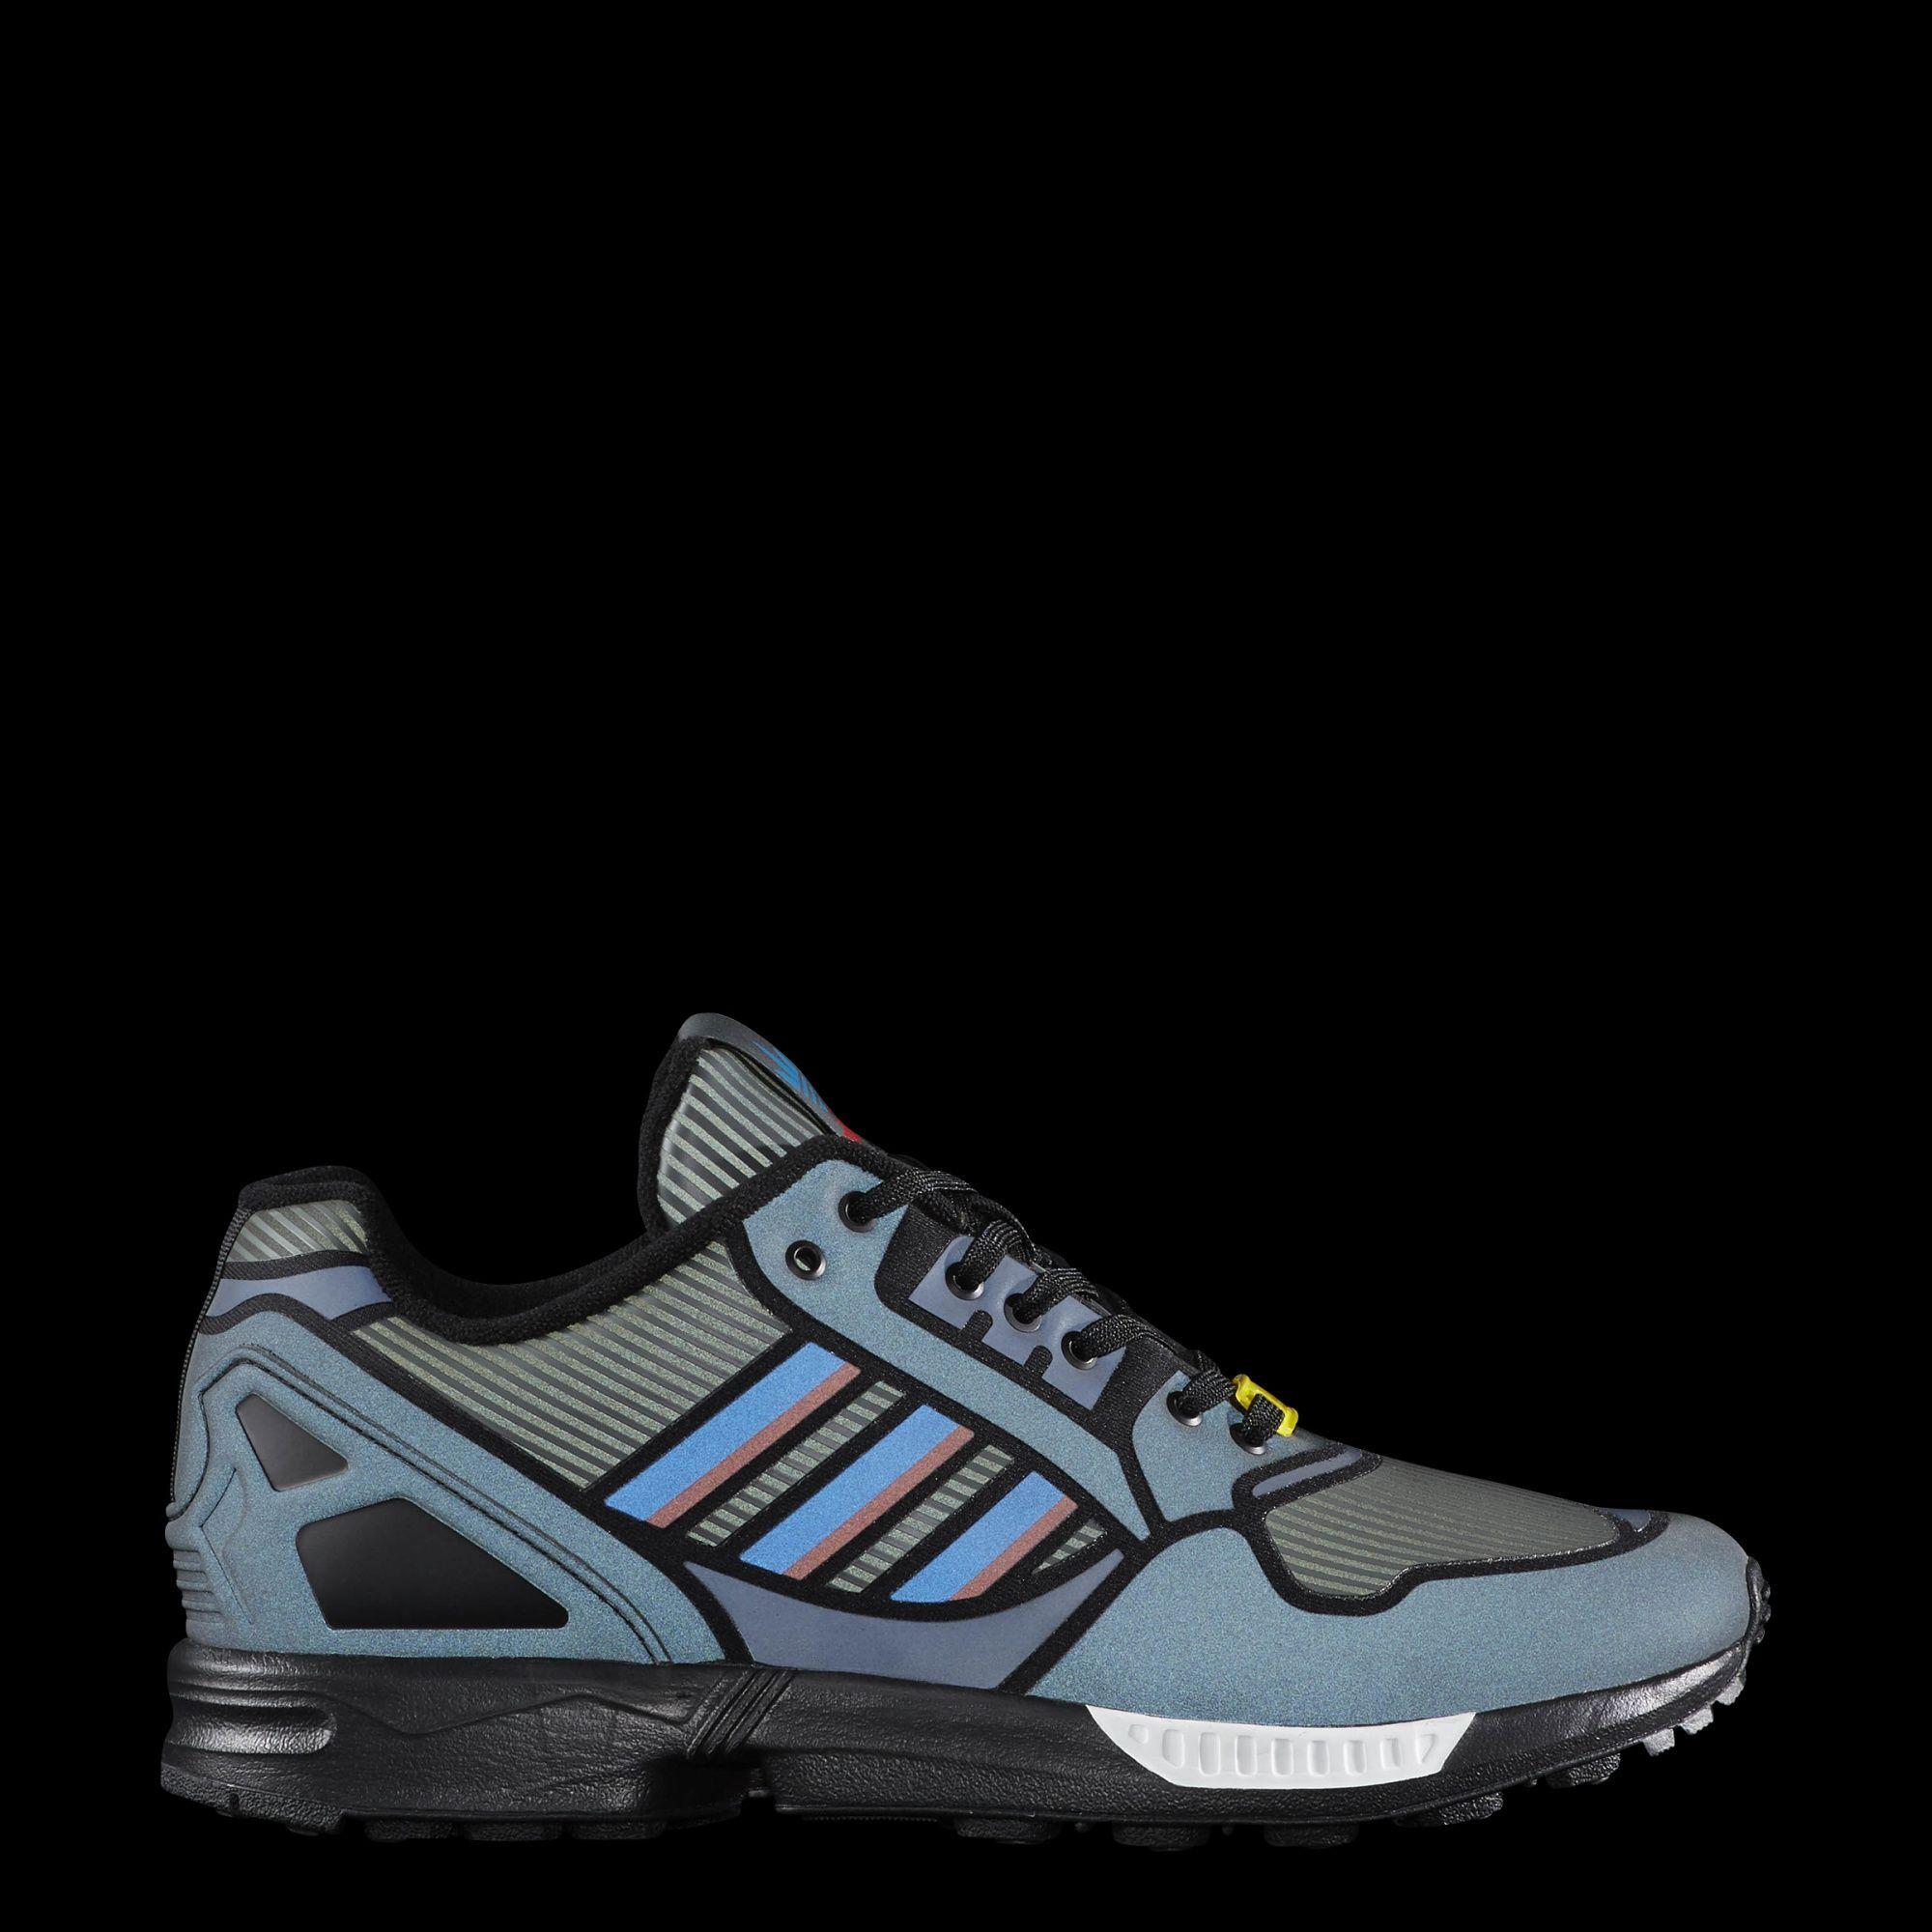 Adidas zx flusso calci pinterest zx flusso, scarpe nere e adidas